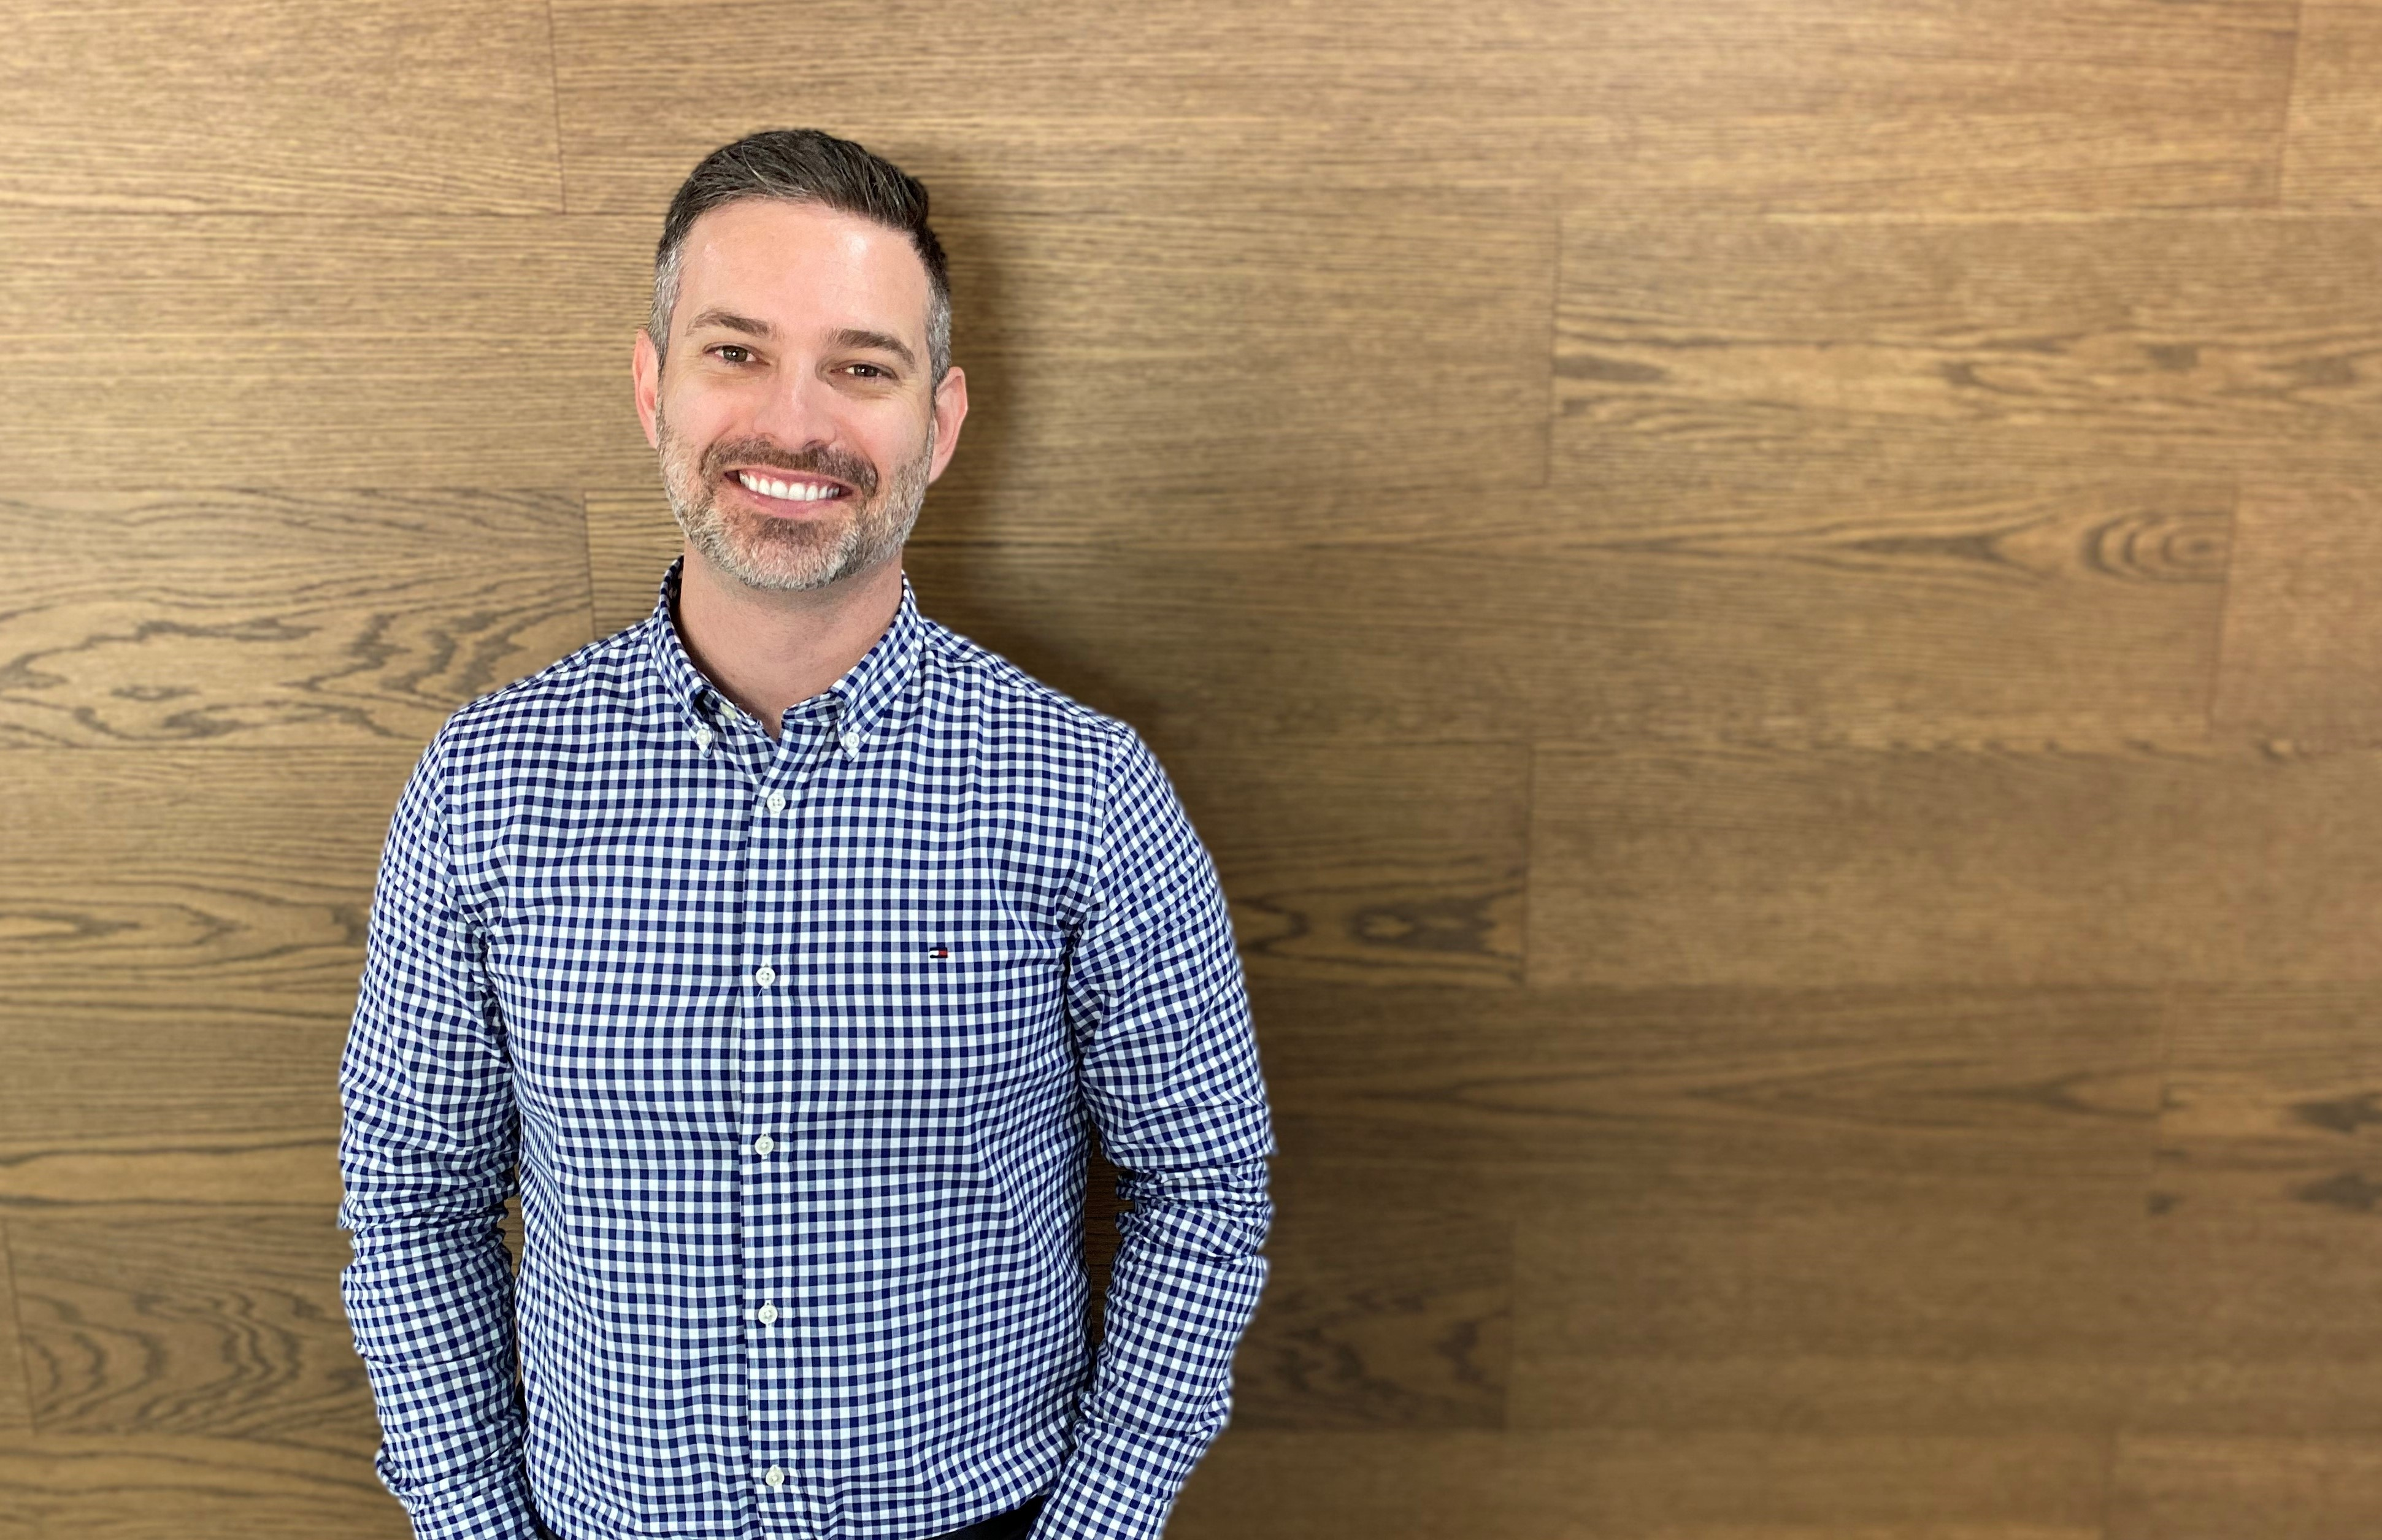 Luke Russell - General Manager - Sydney Region